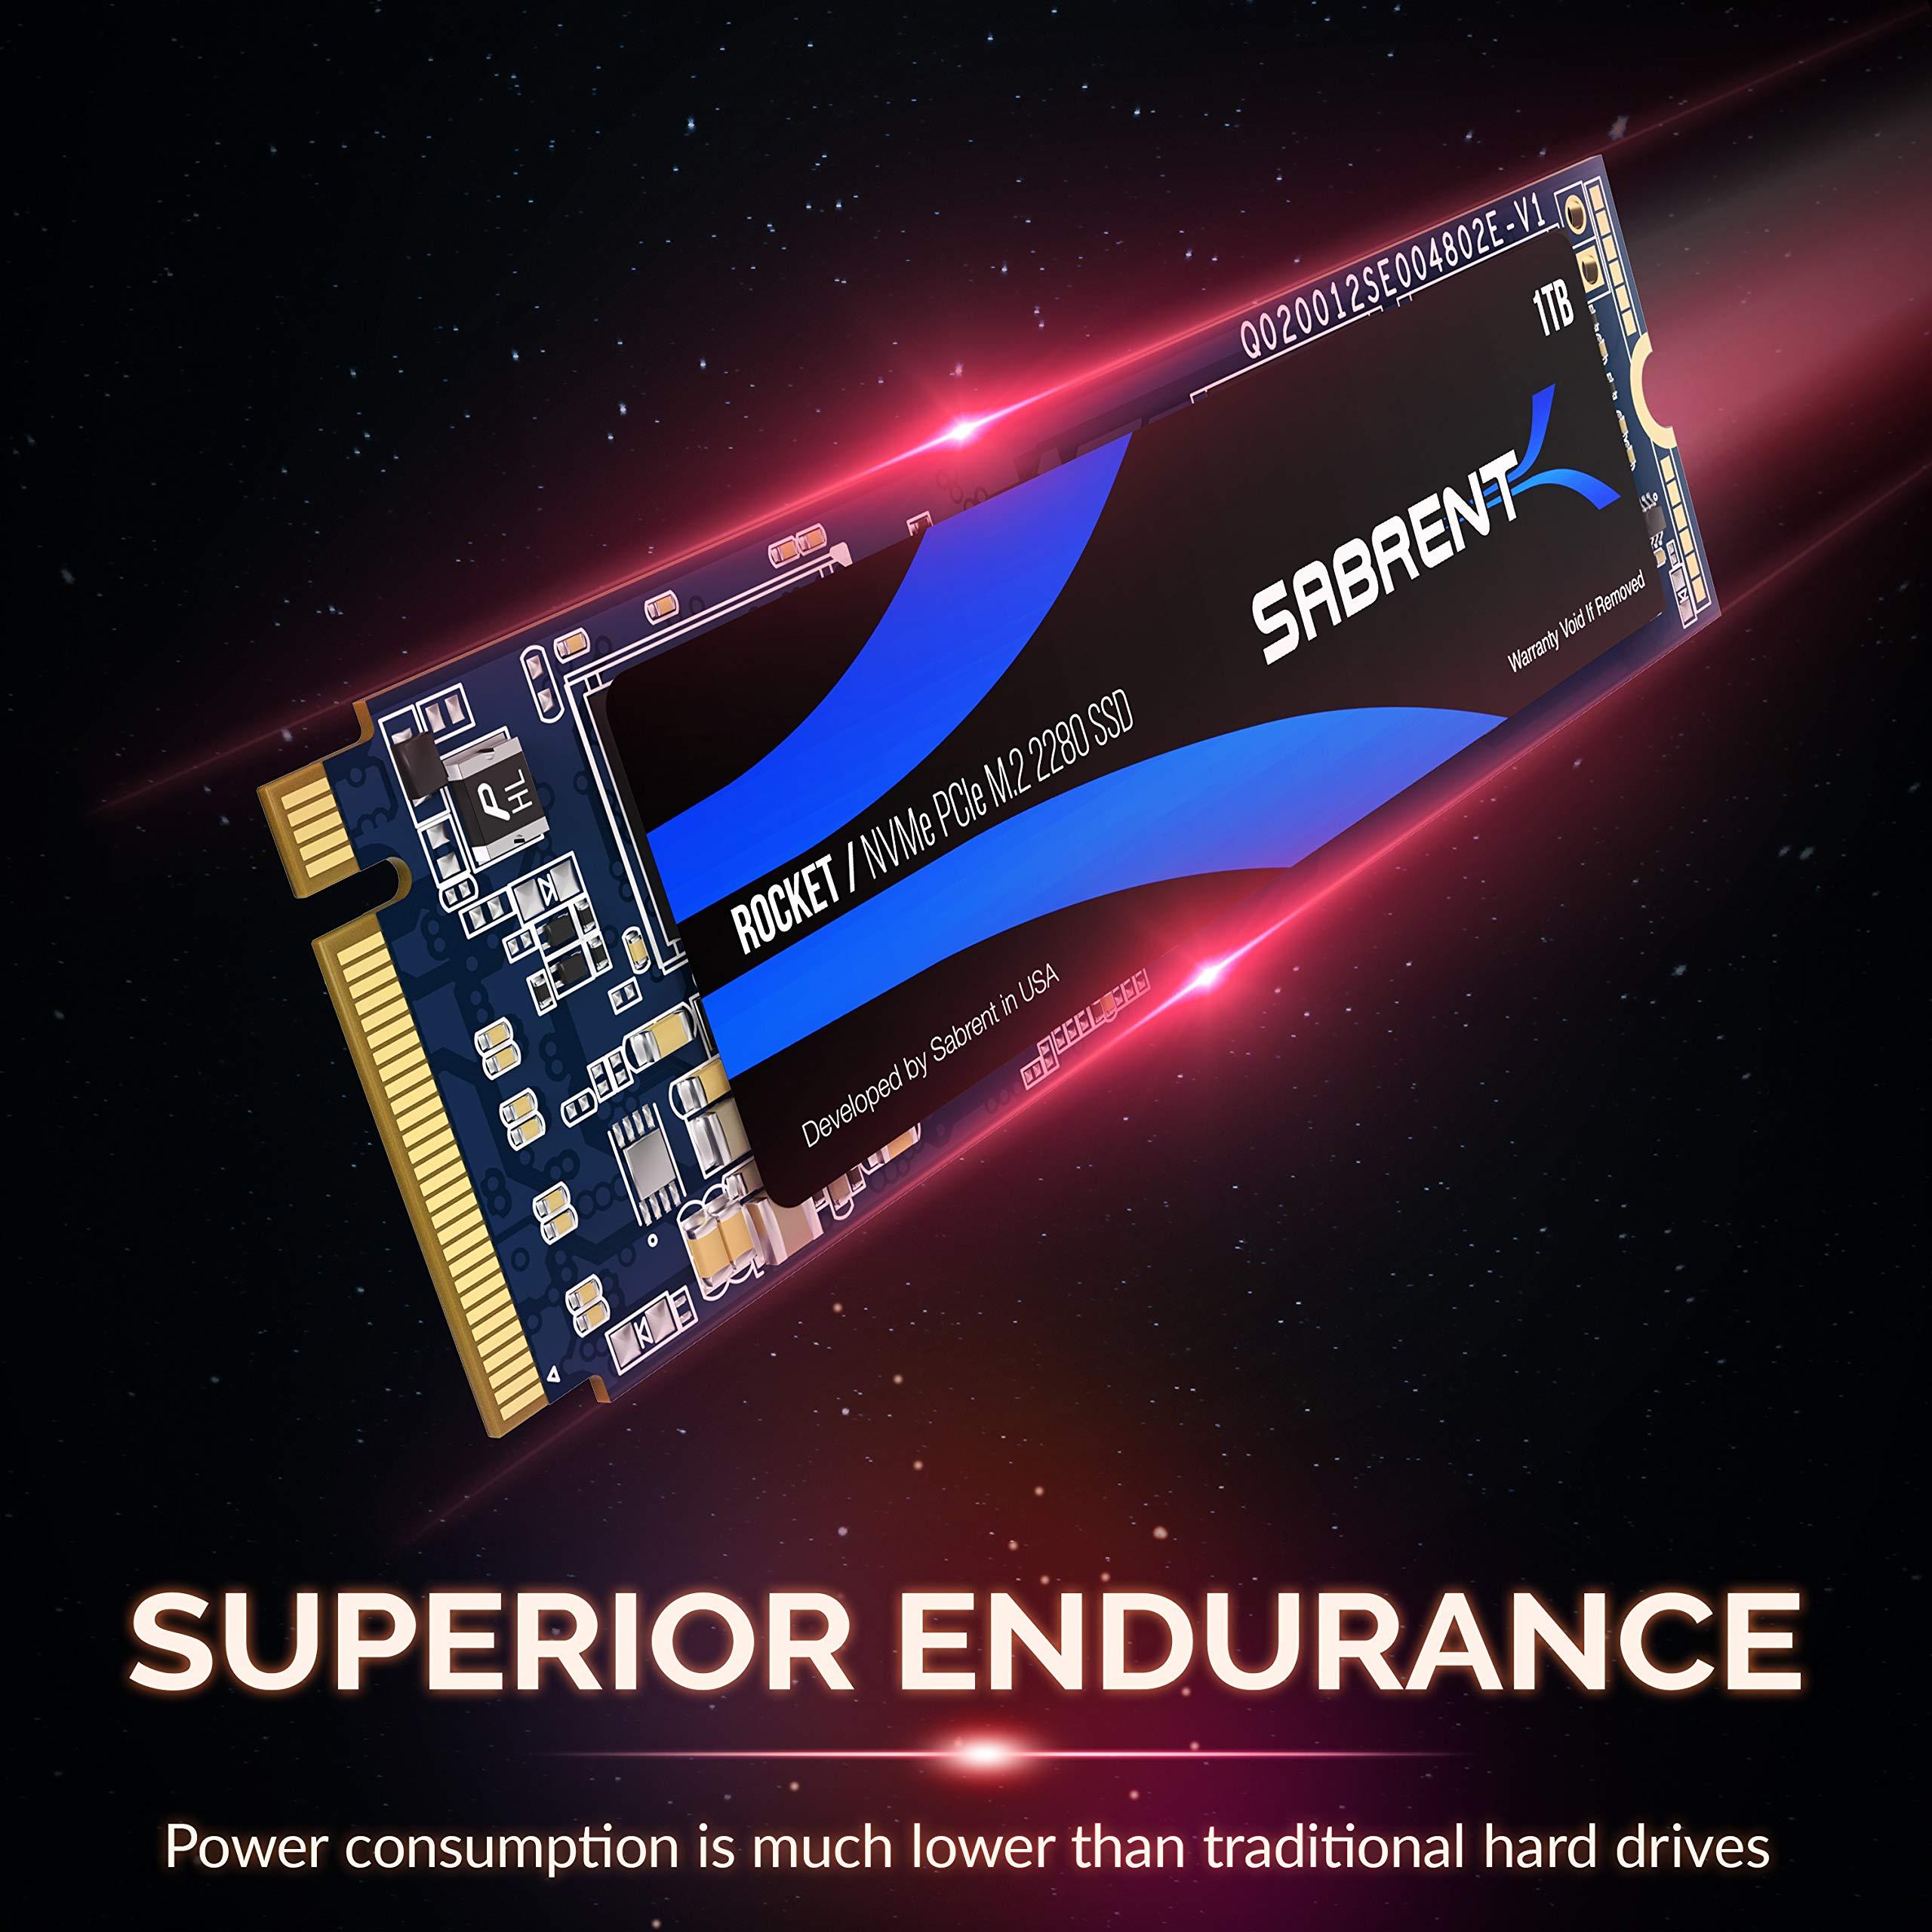 Sabrent 1TB Rocket NVMe PCIe M.2 2280 Internal SSD High Performance Solid State Drive (SB-ROCKET-1TB) by Sabrent (Image #4)